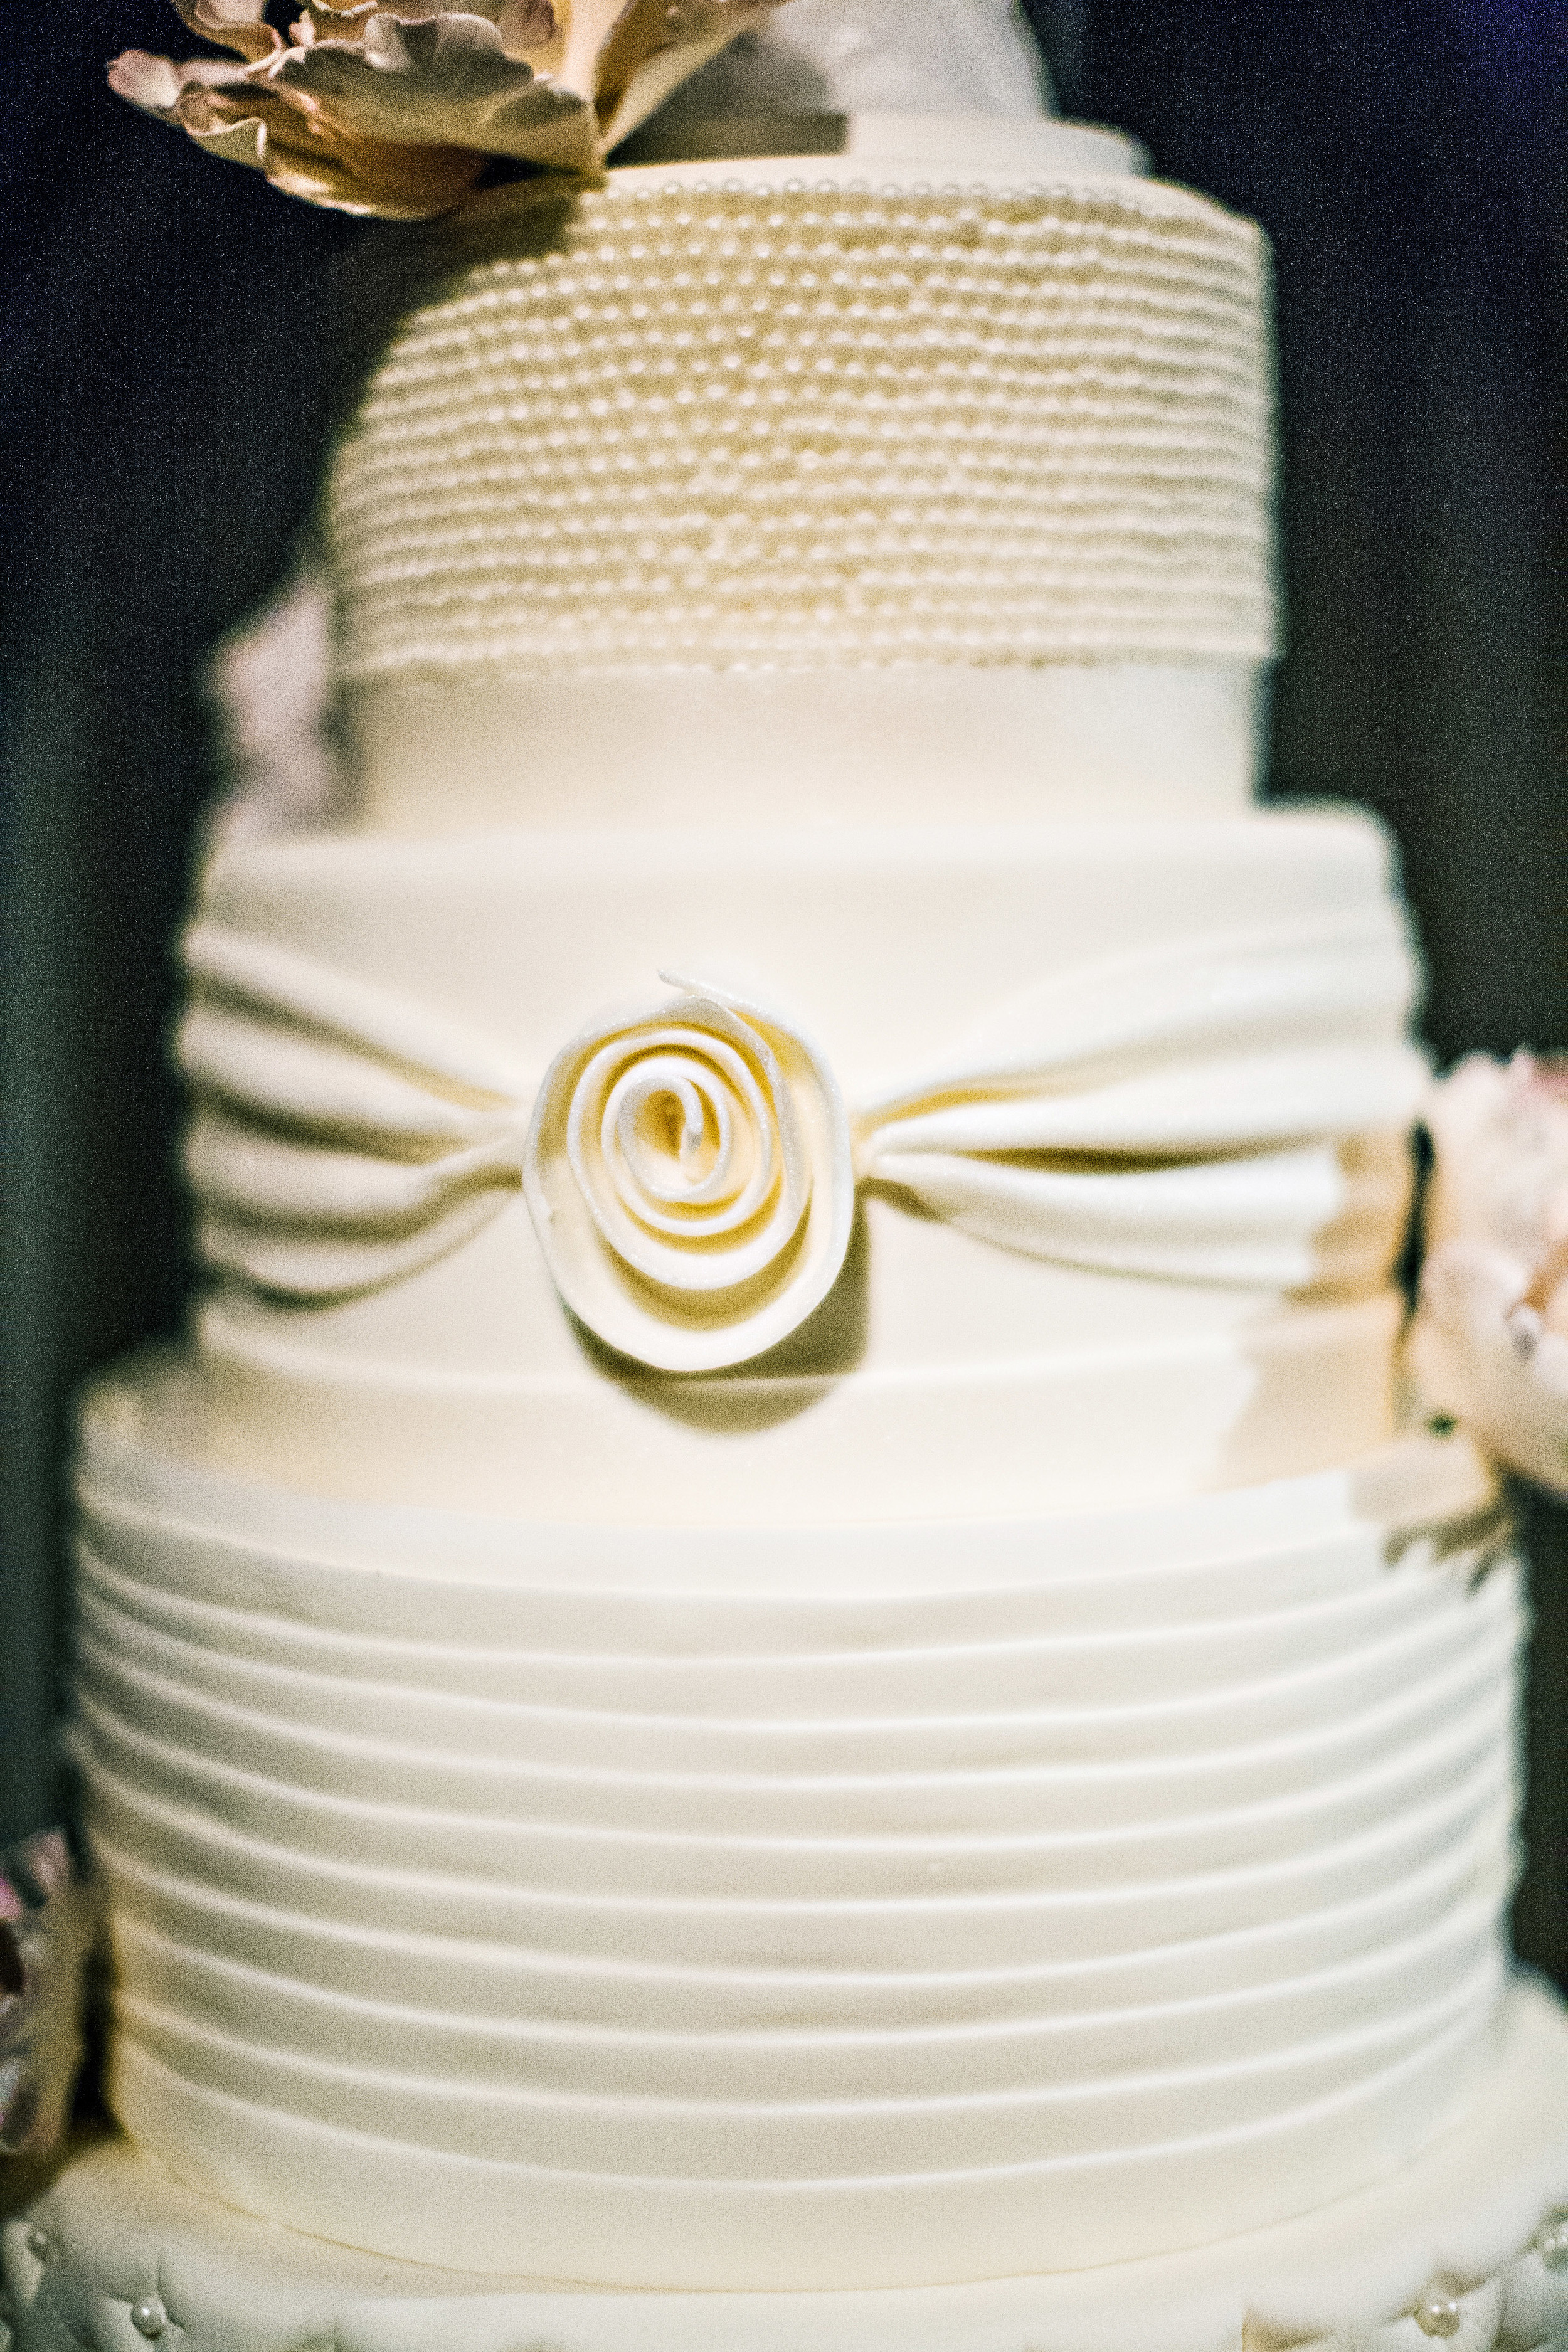 56. RS - modern+romantic wedding cake,  white+ruffle + tufted+pearl+ rouching wedding cake, summer wedding cakes, gorgeous wedding cakes.jpg